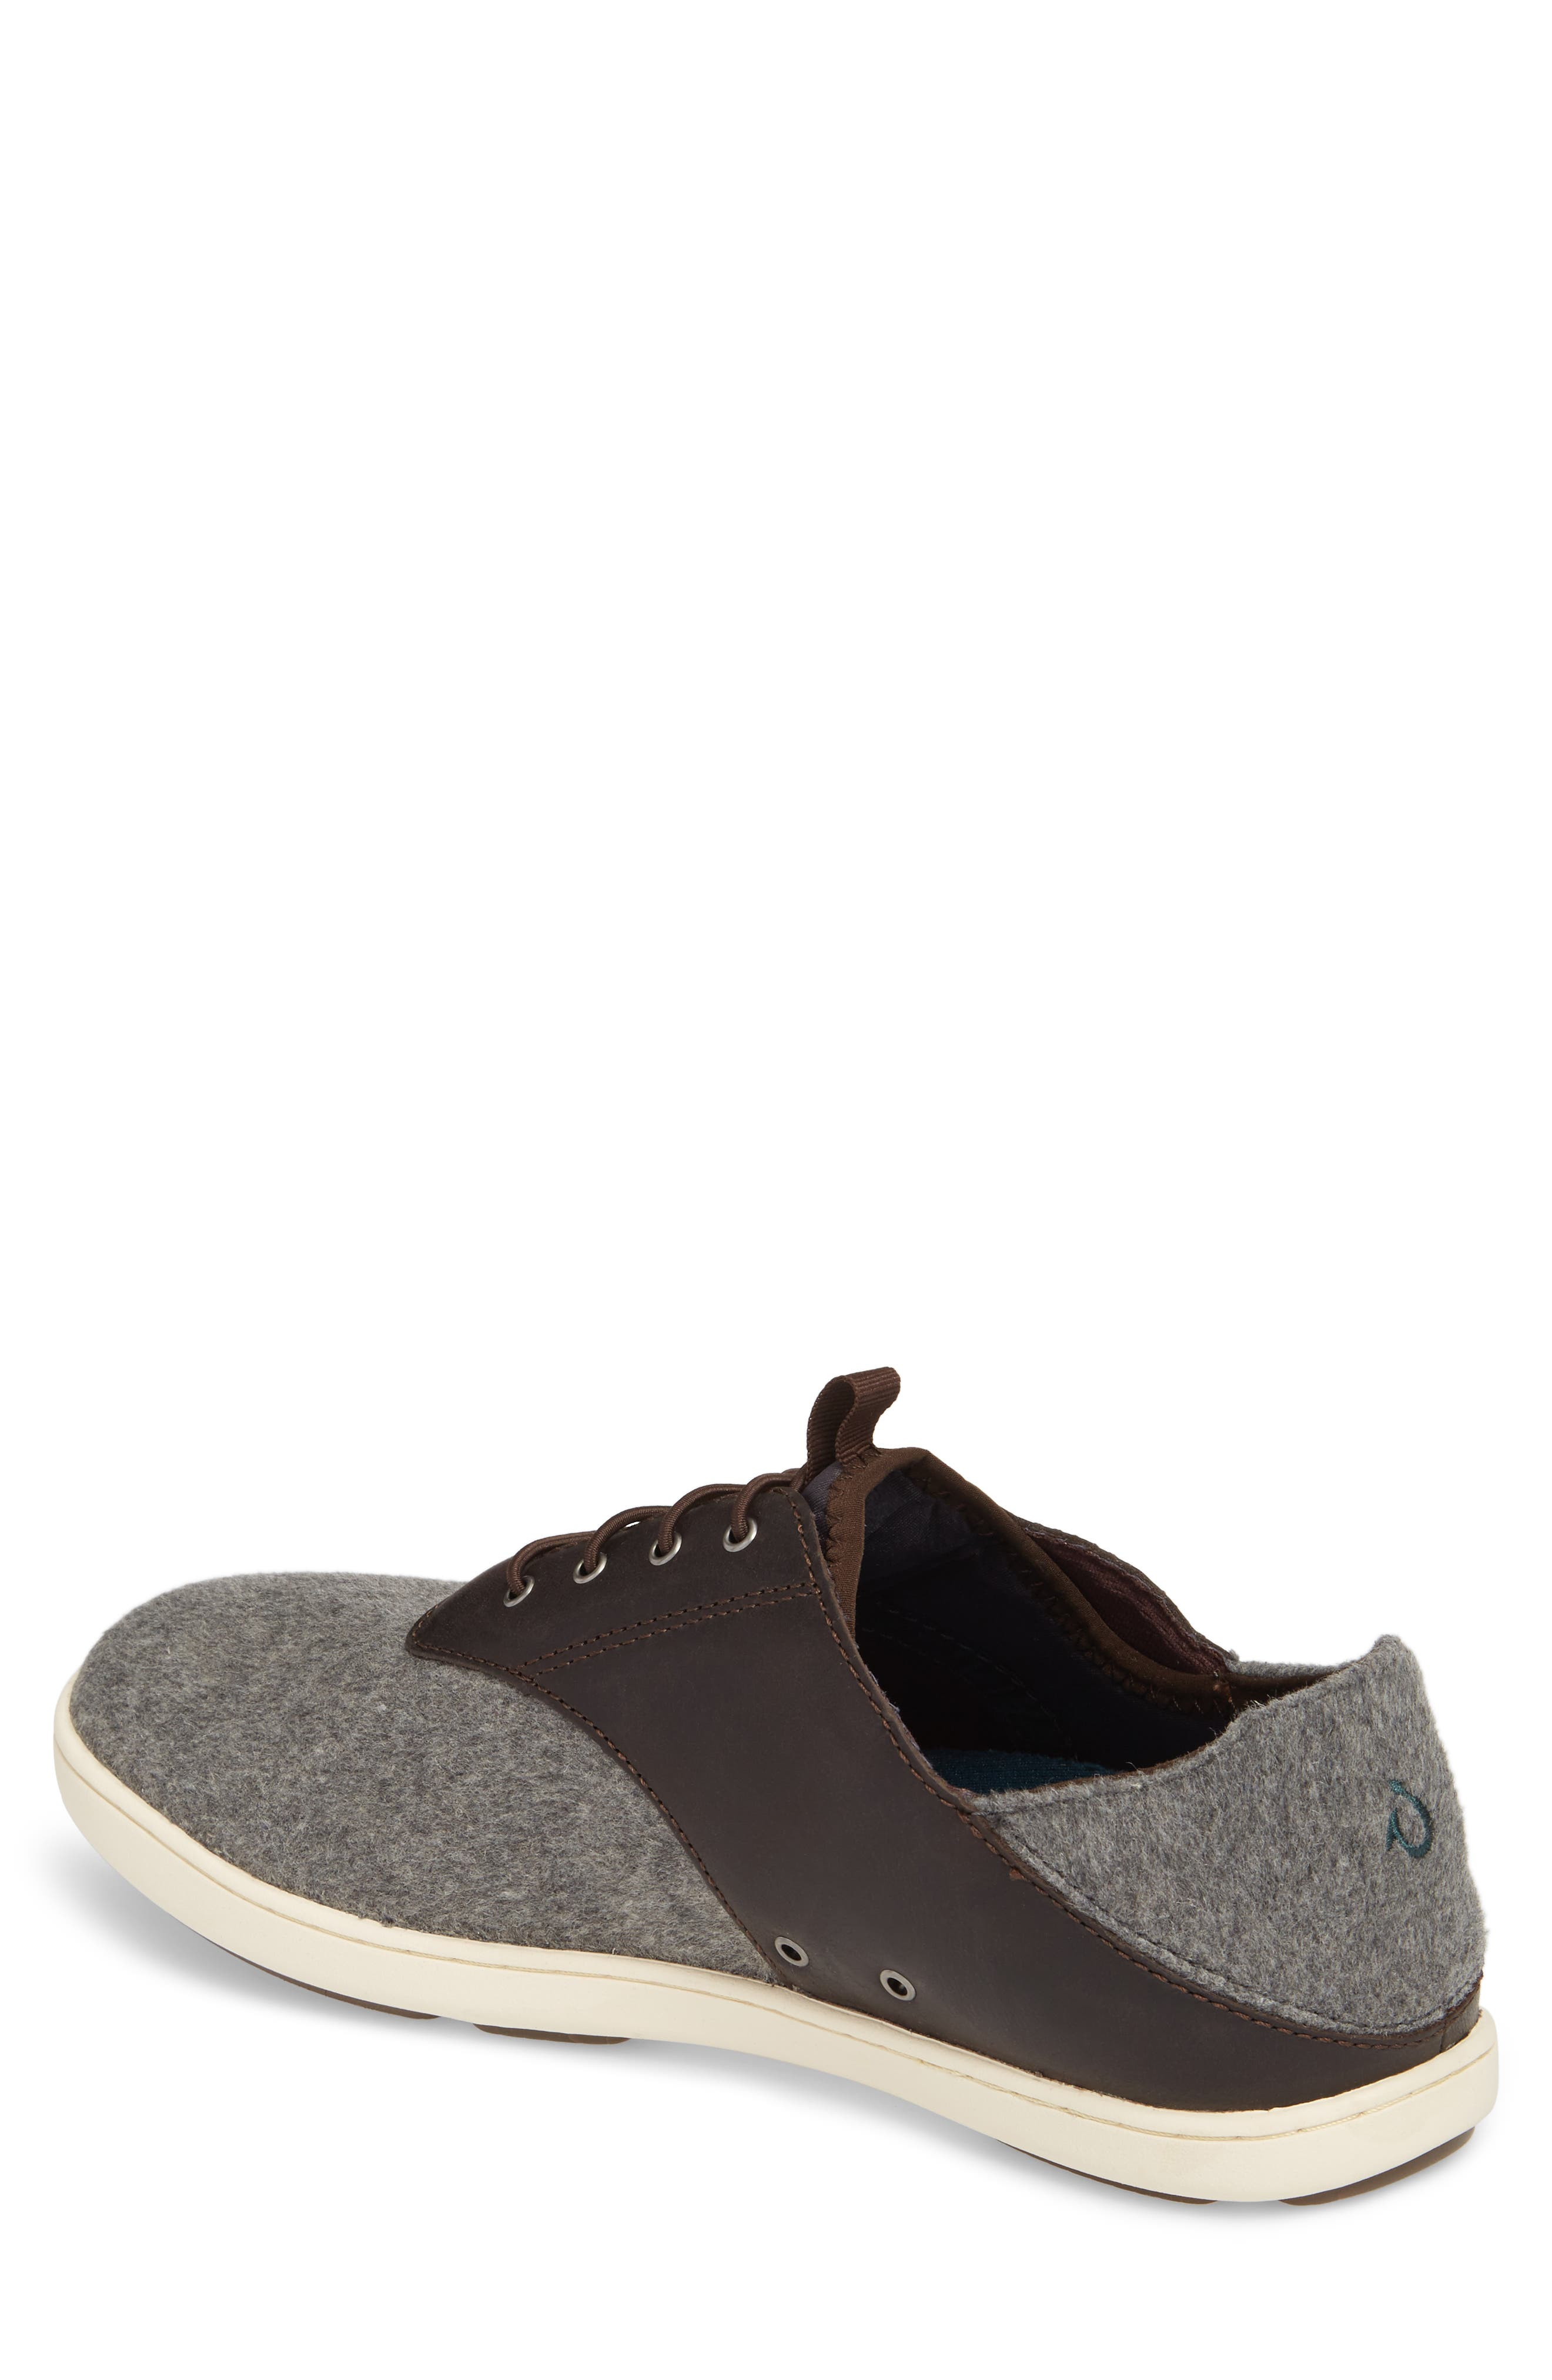 Nohea Moku Hulu Sneaker,                             Alternate thumbnail 2, color,                             Dark Roast/ Charcoal Wool